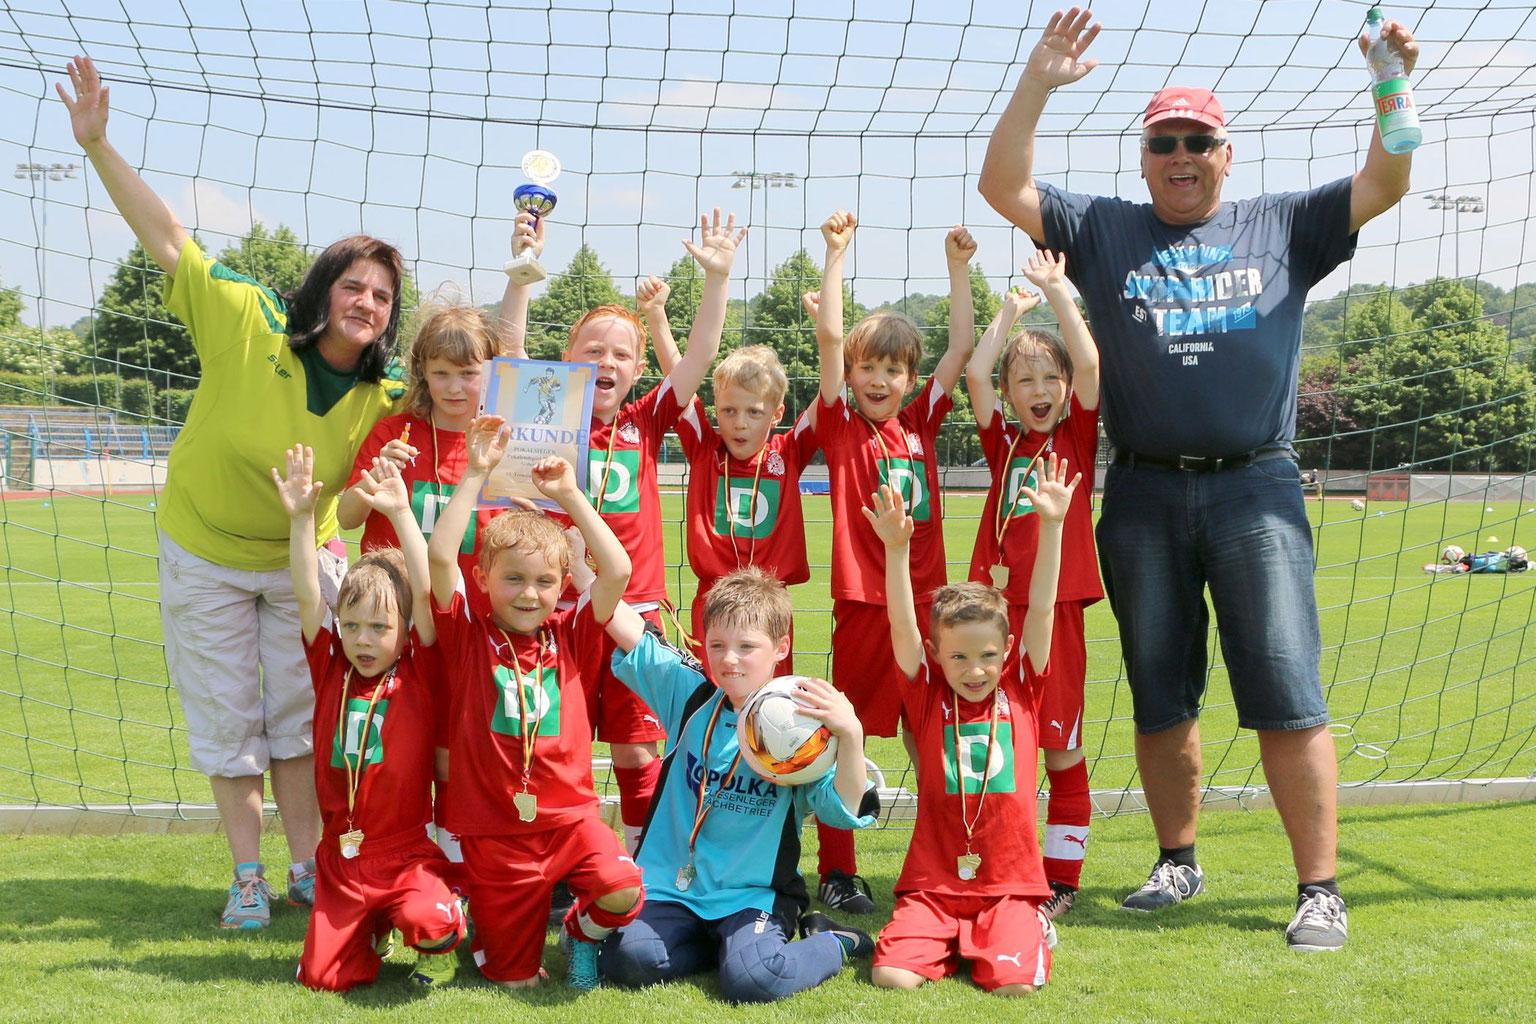 News Saison 2016/2017 - SV Tresenwald Machern